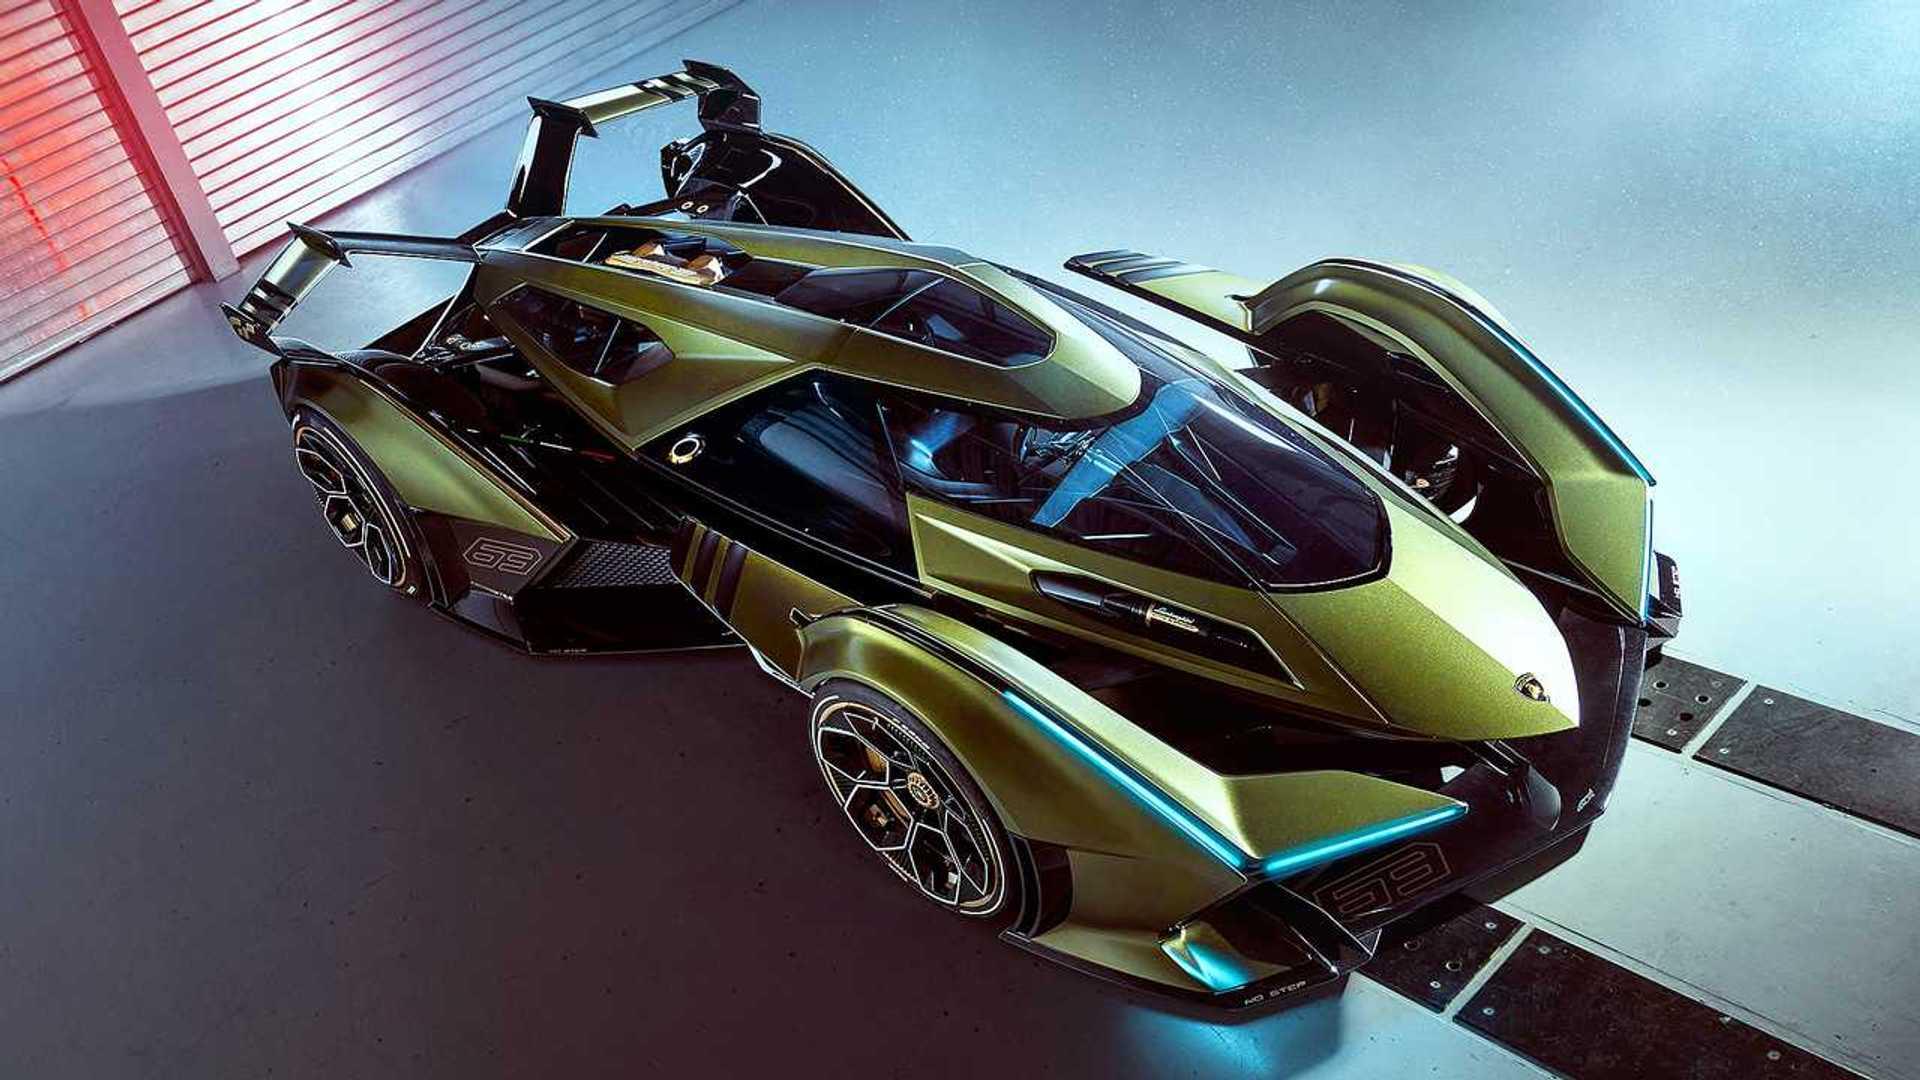 Lambo V12 Vision Gran Turismo Unveiled As \u0027The Best Virtual